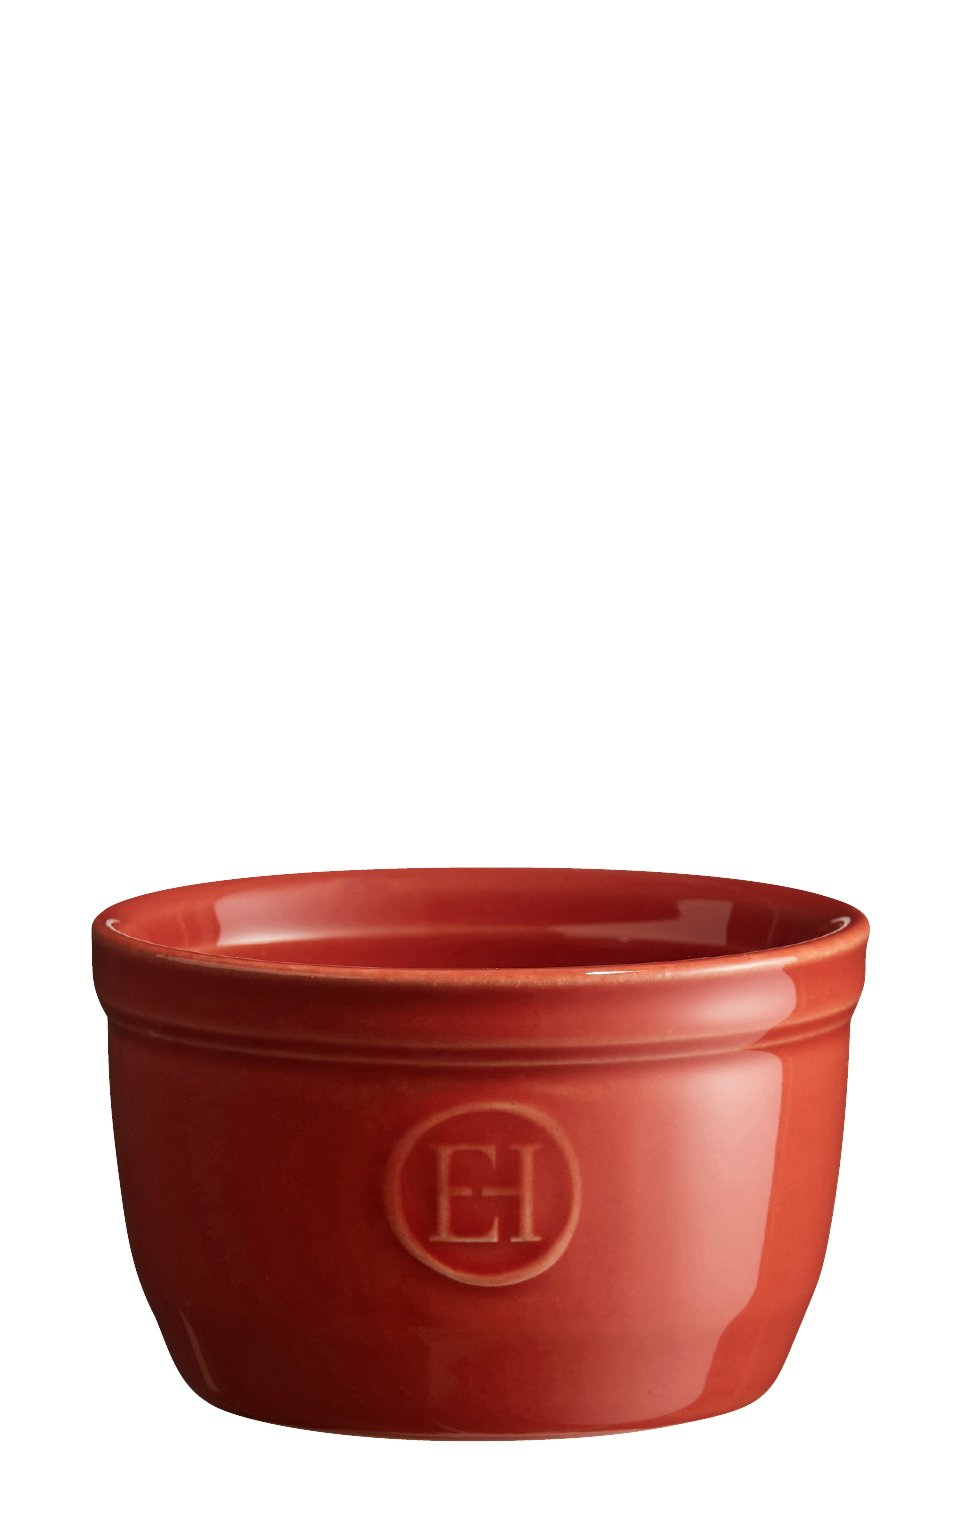 Рамекин Emile Henry 9 см, цвет: терракот, малый